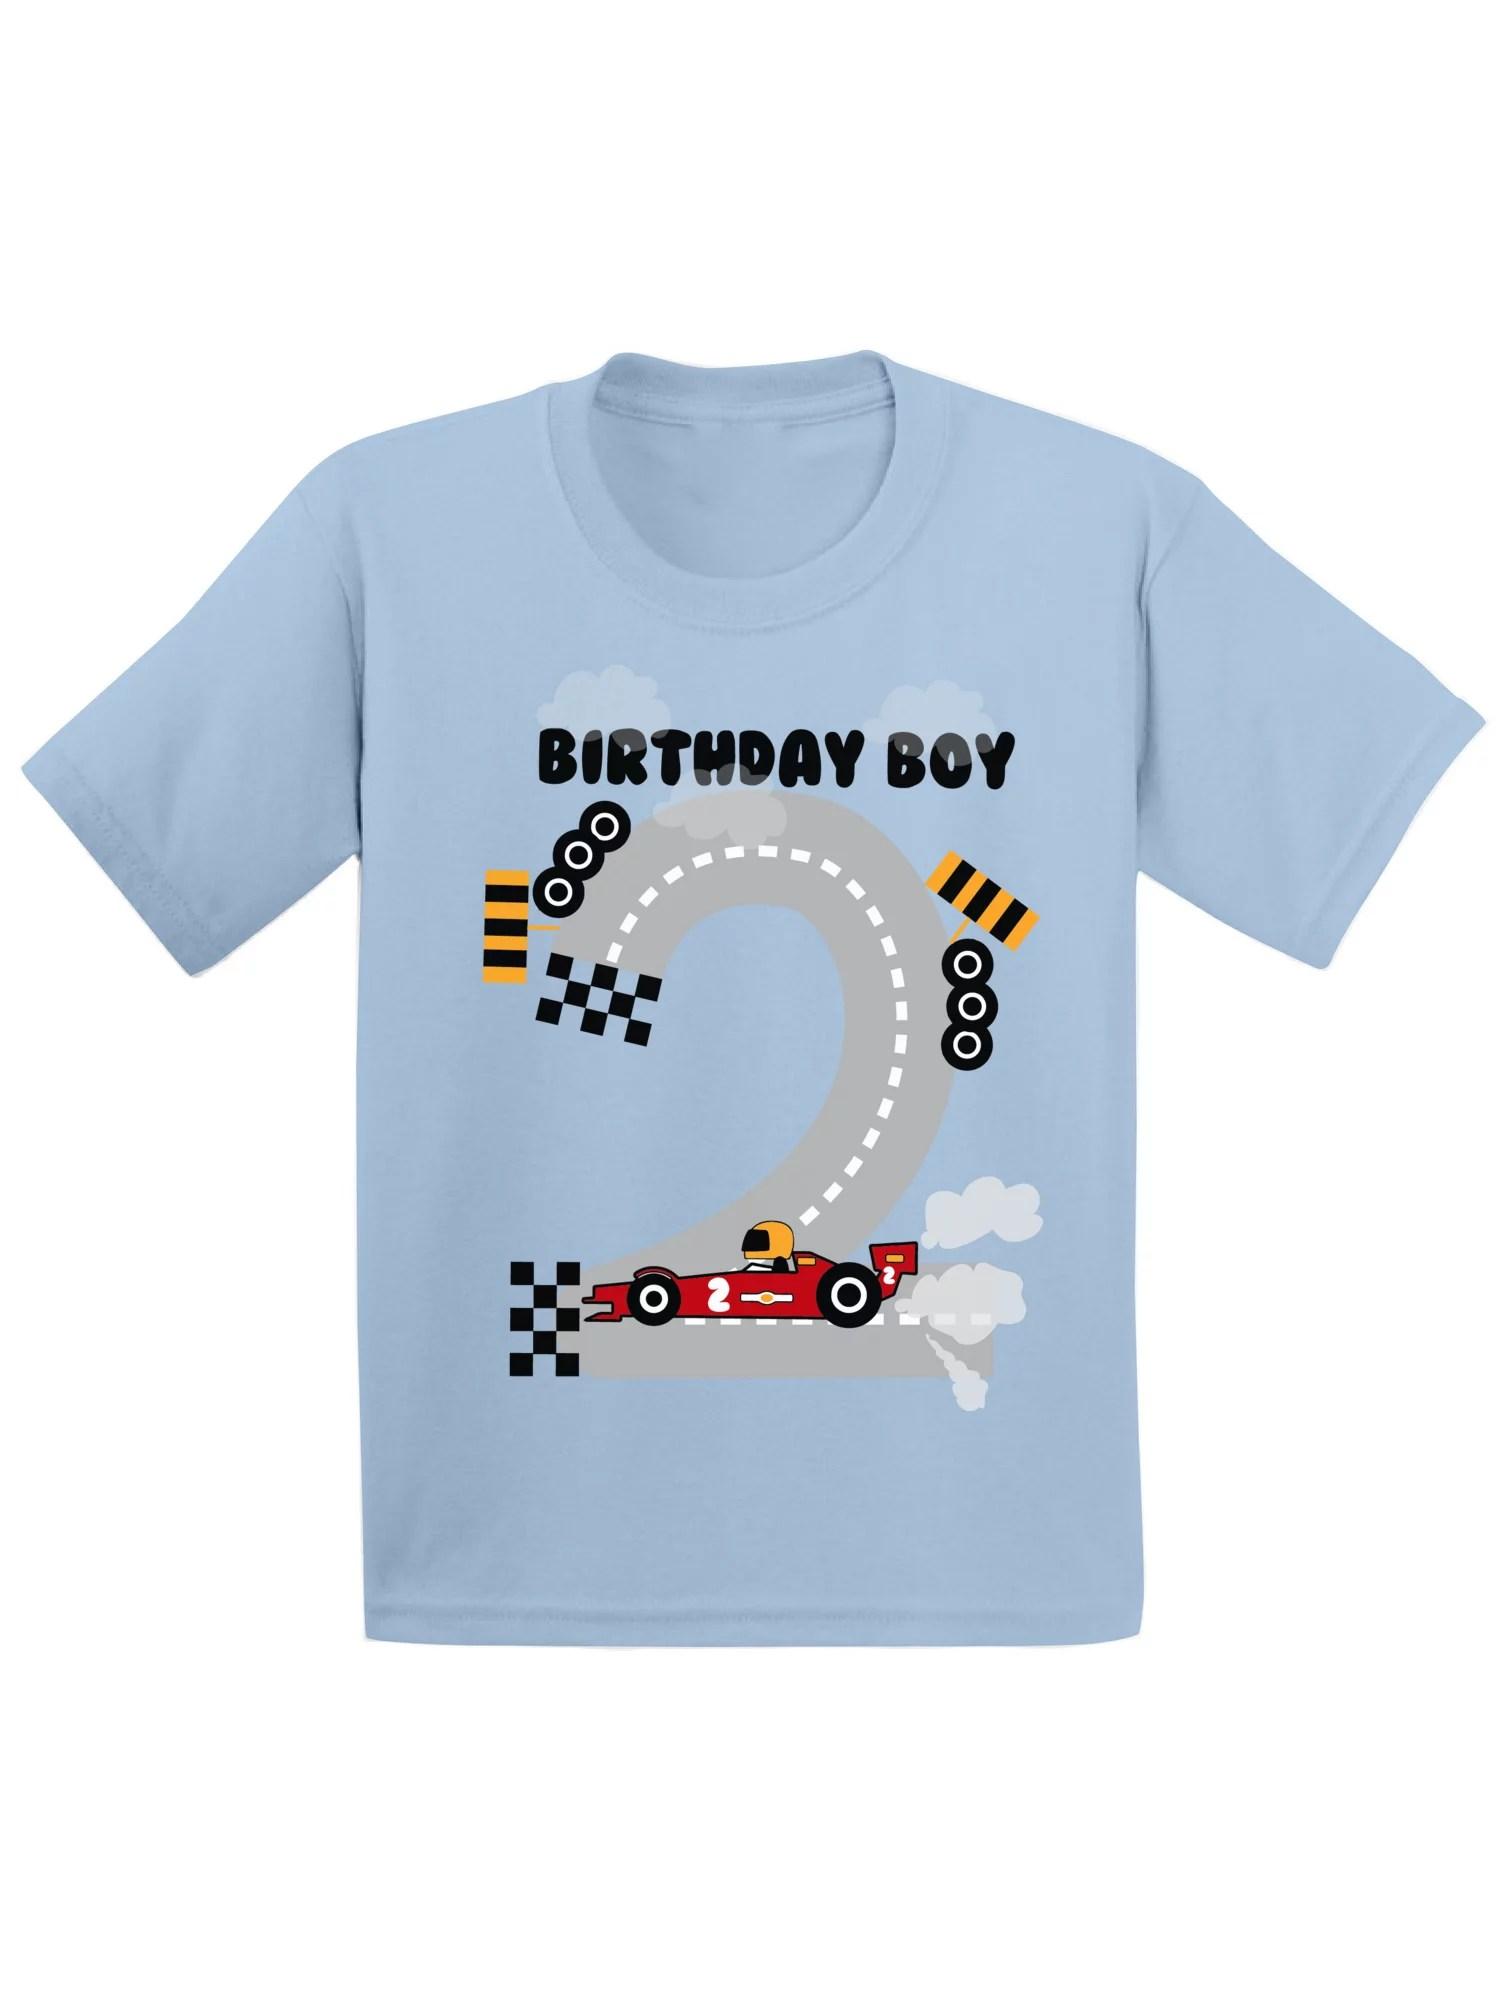 Tops Tees Girls Clothing Second Birthday Boy Tee Toddler Birthday Shirt 2nd Birthday Party Shirt Baby Boy Birthday Outfit 2nd Birthday Shirt Two Birthday Shirt